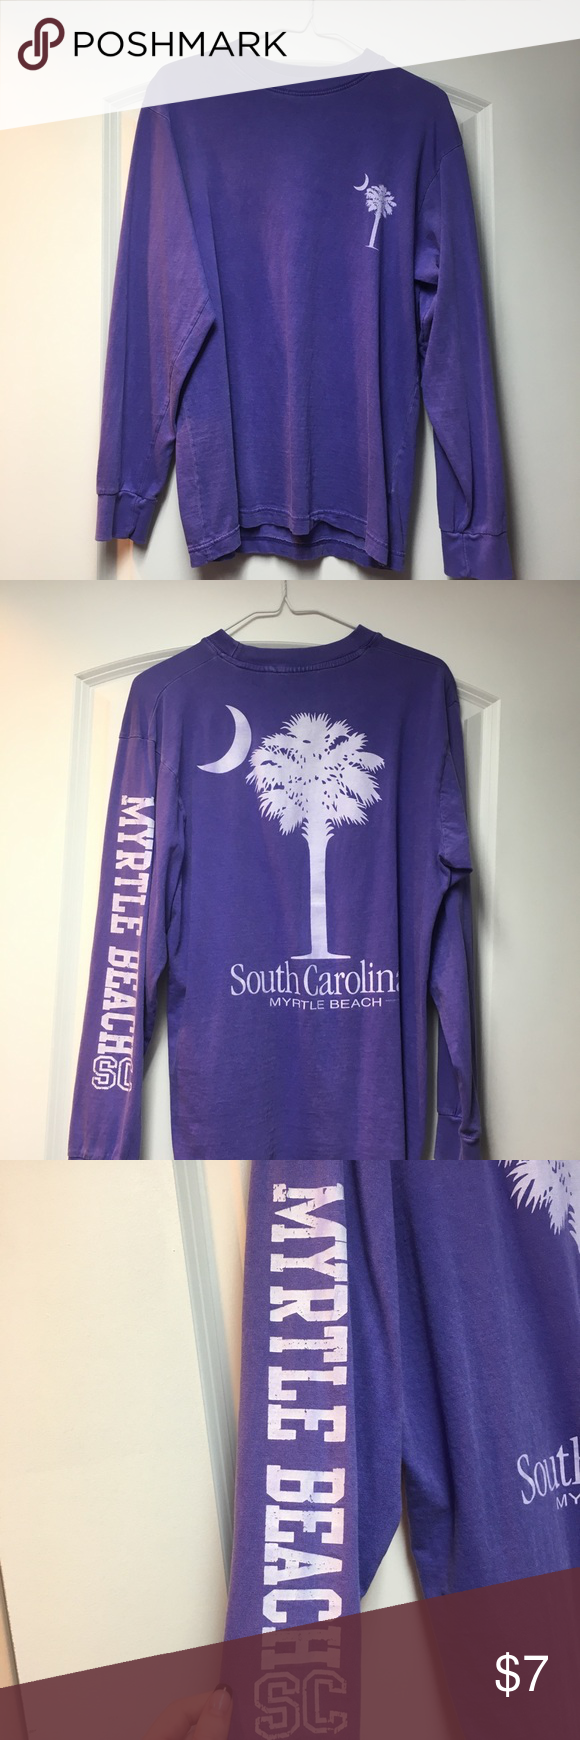 South Carolina Myrtle Beach Shirt Beach Shirts Myrtle Beach South Carolina Long Sleeve Tshirt Men